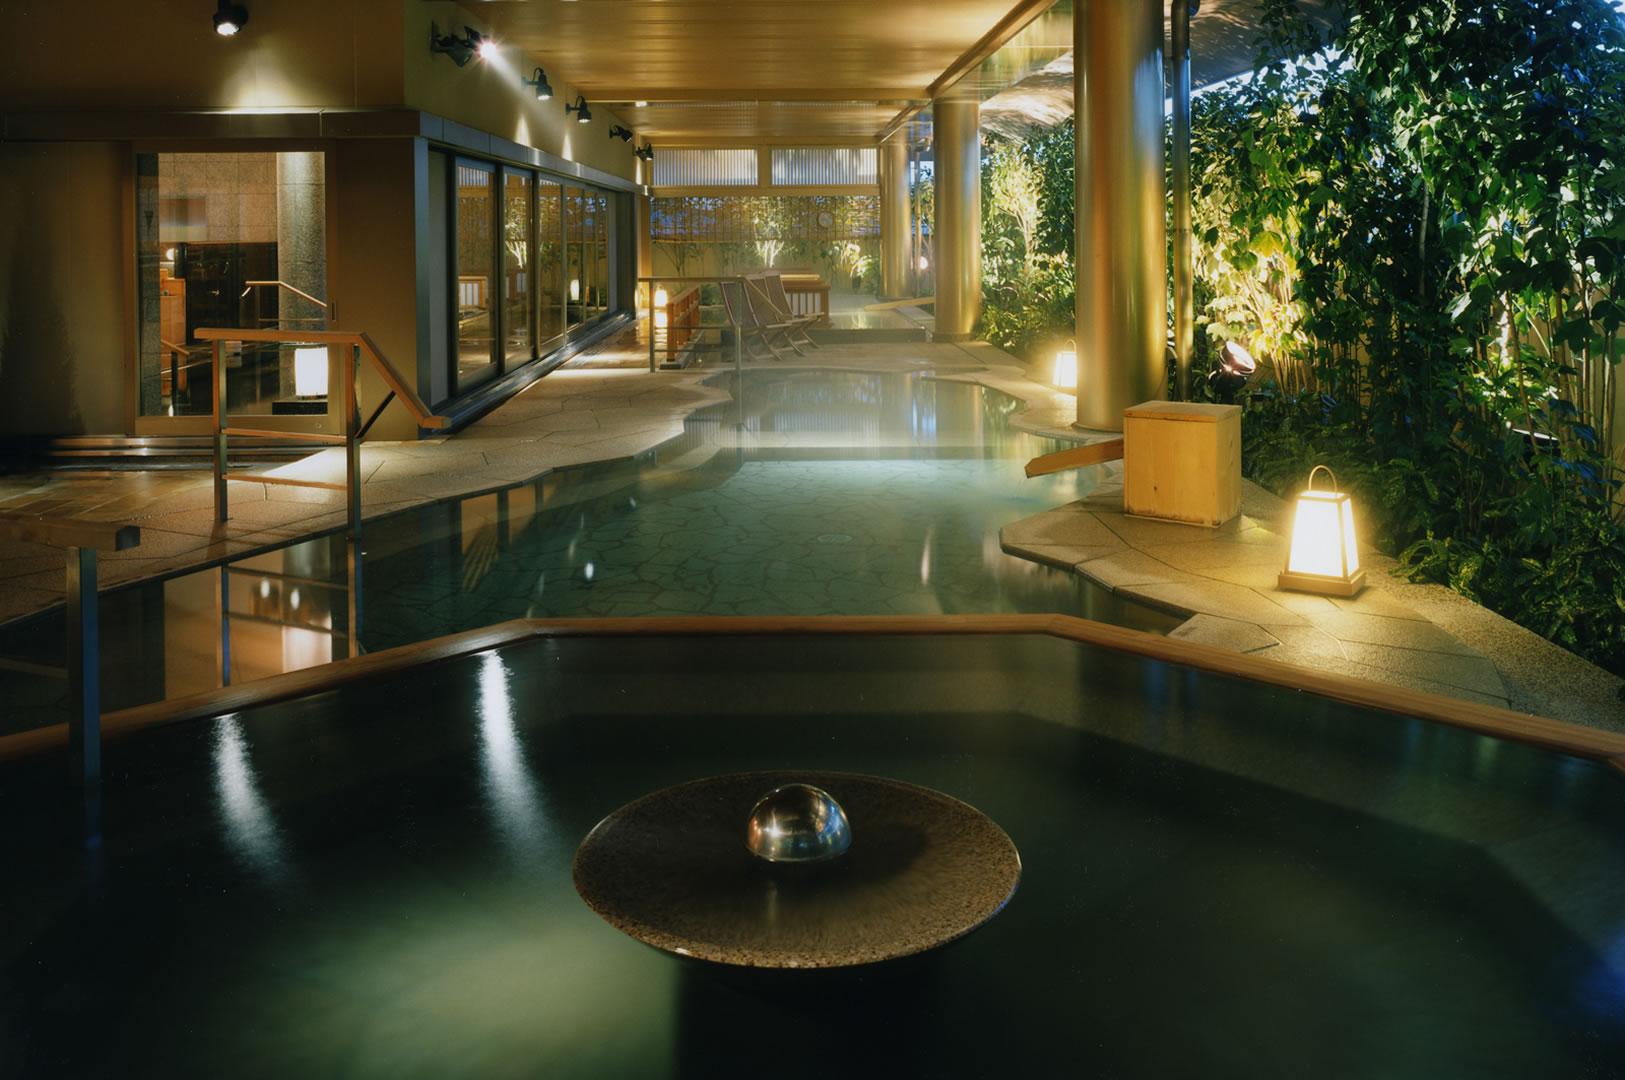 Japanese Style Inn and Hot Spring Spa | ArchitectiralDesign | JCAP7